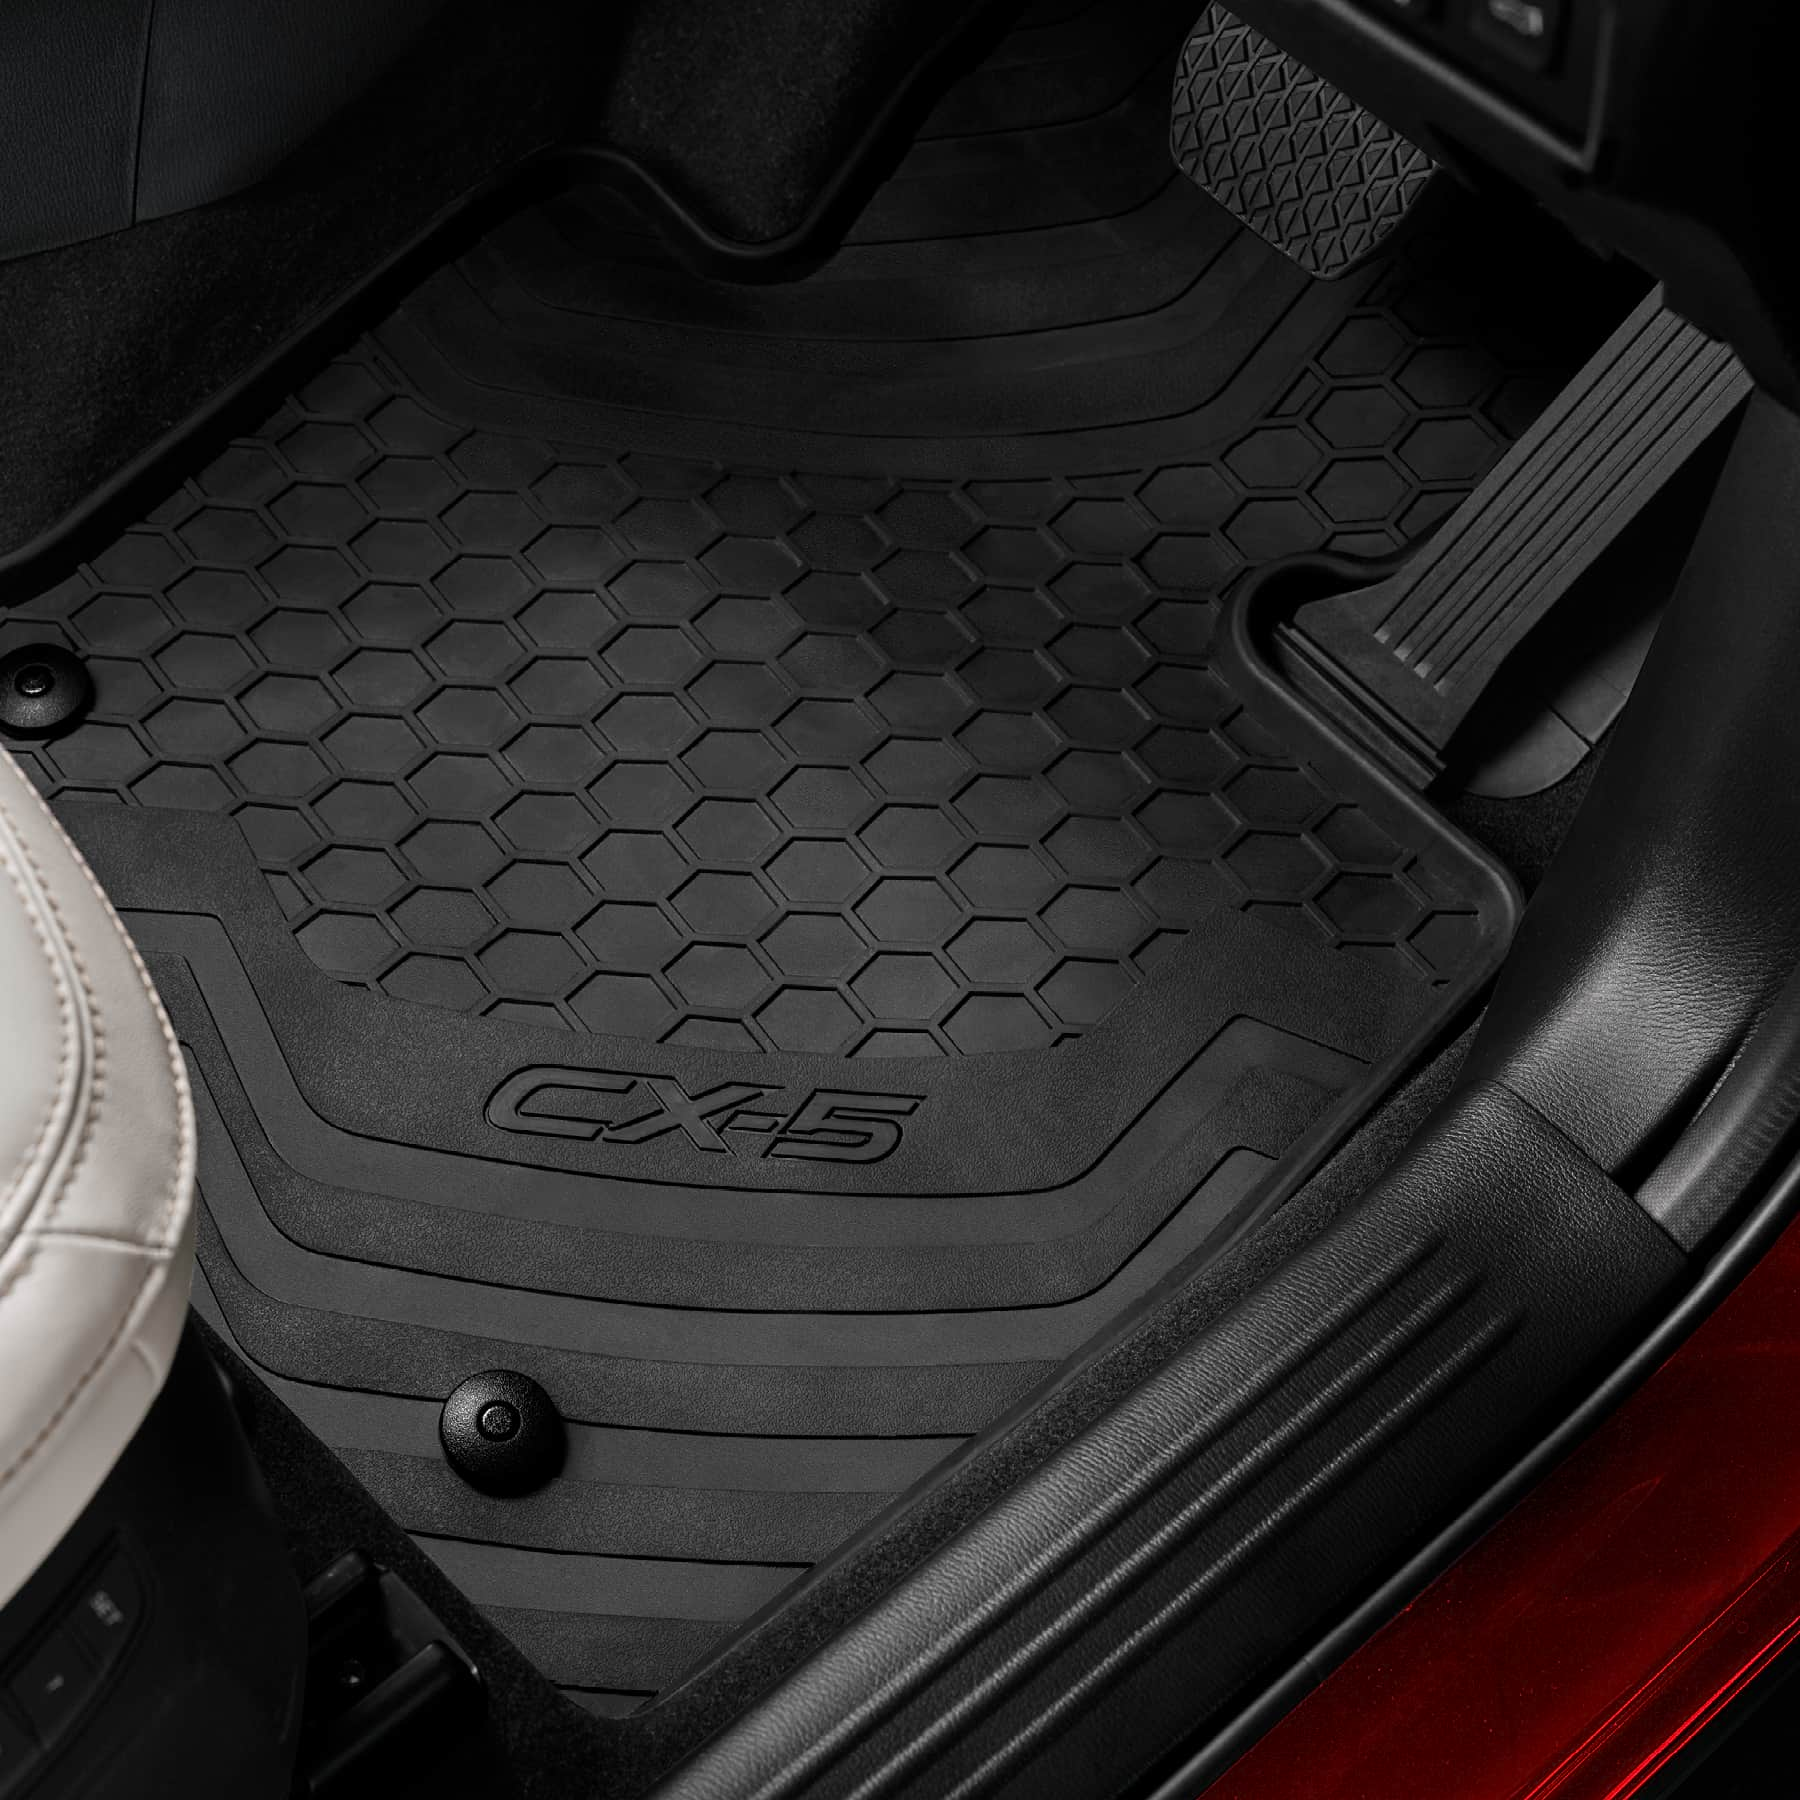 New Genuine Mazda Set Of 4 Rubber Floor Mats Kf Cx 5 Cx5 Kf11acfmr Ebay